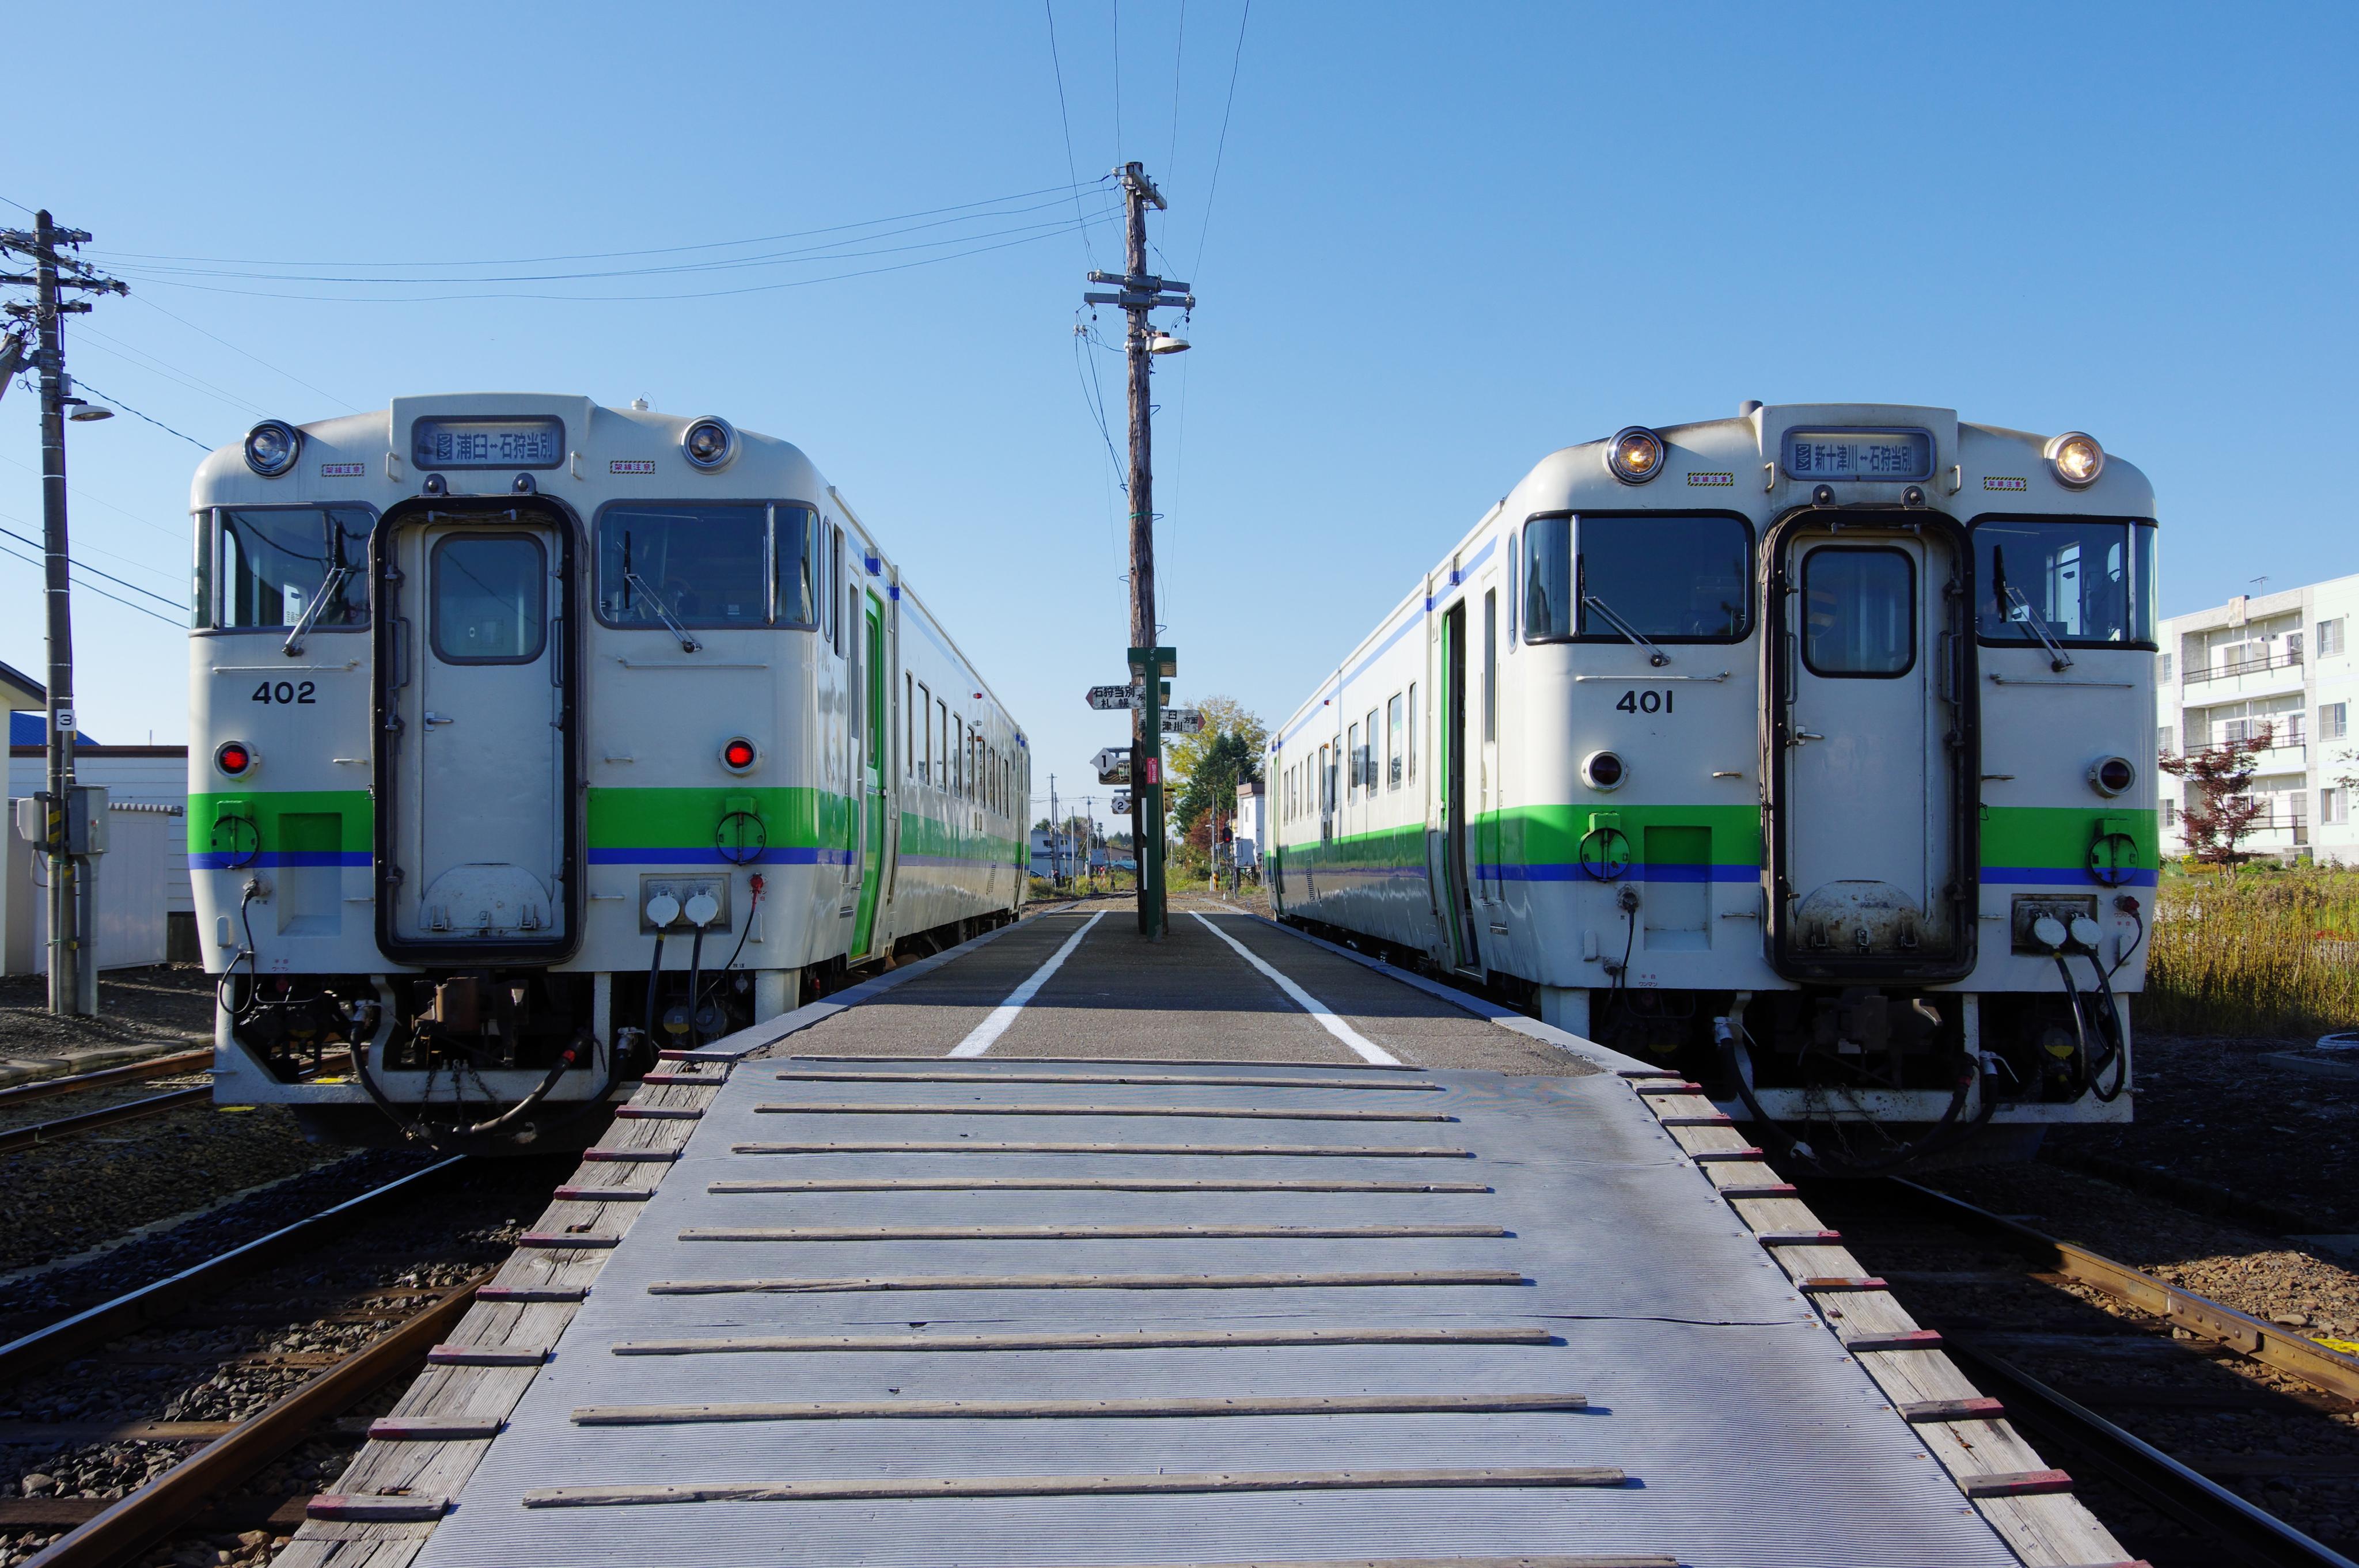 石狩月形駅 キハ40 401+402_181014.jpg